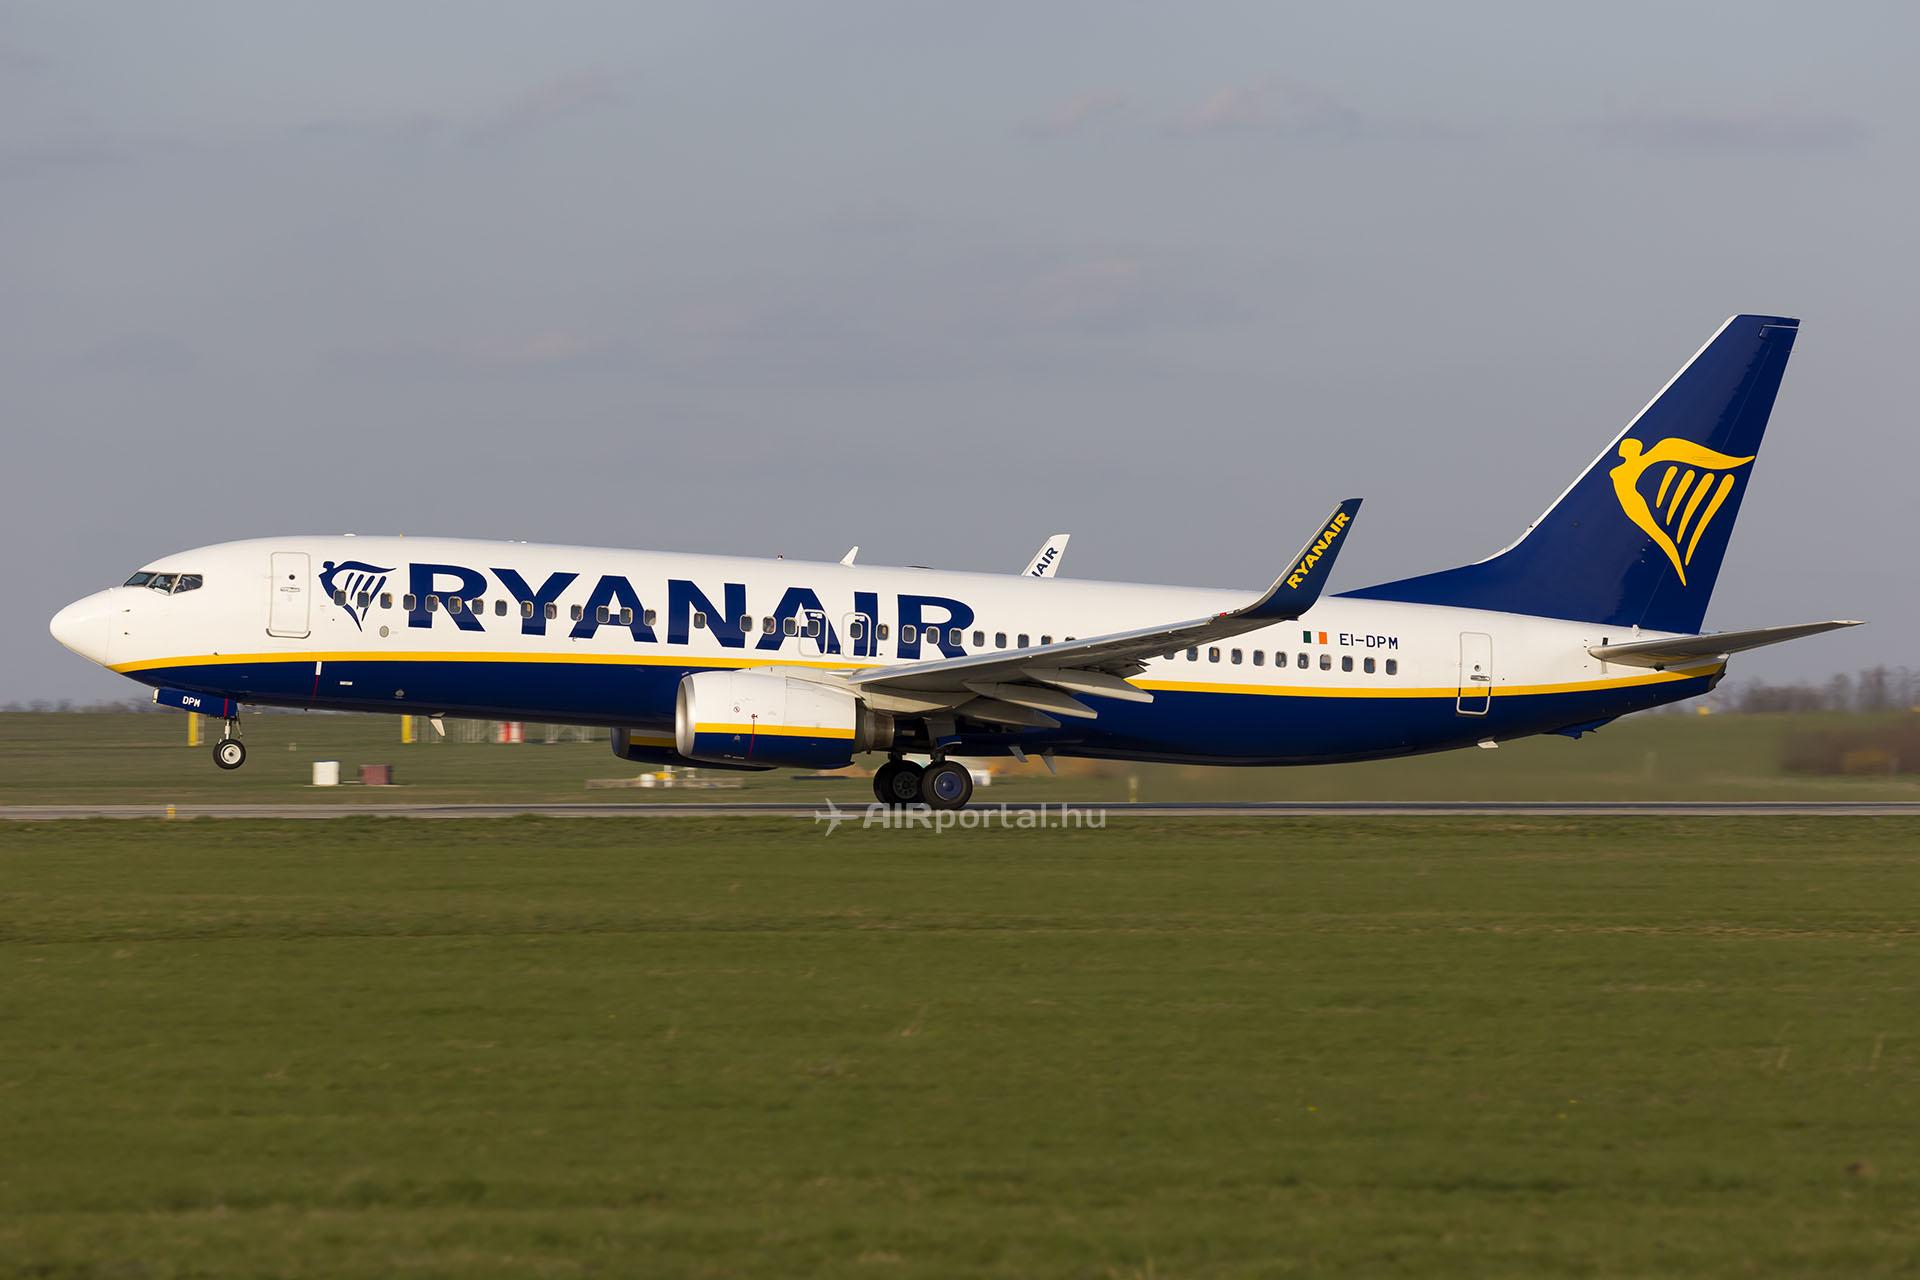 A Ryanair egyik Boeing 737-800-as repülőgépe Budapesten. (Fotó: AIRportal.hu) | © AIRportal.hu